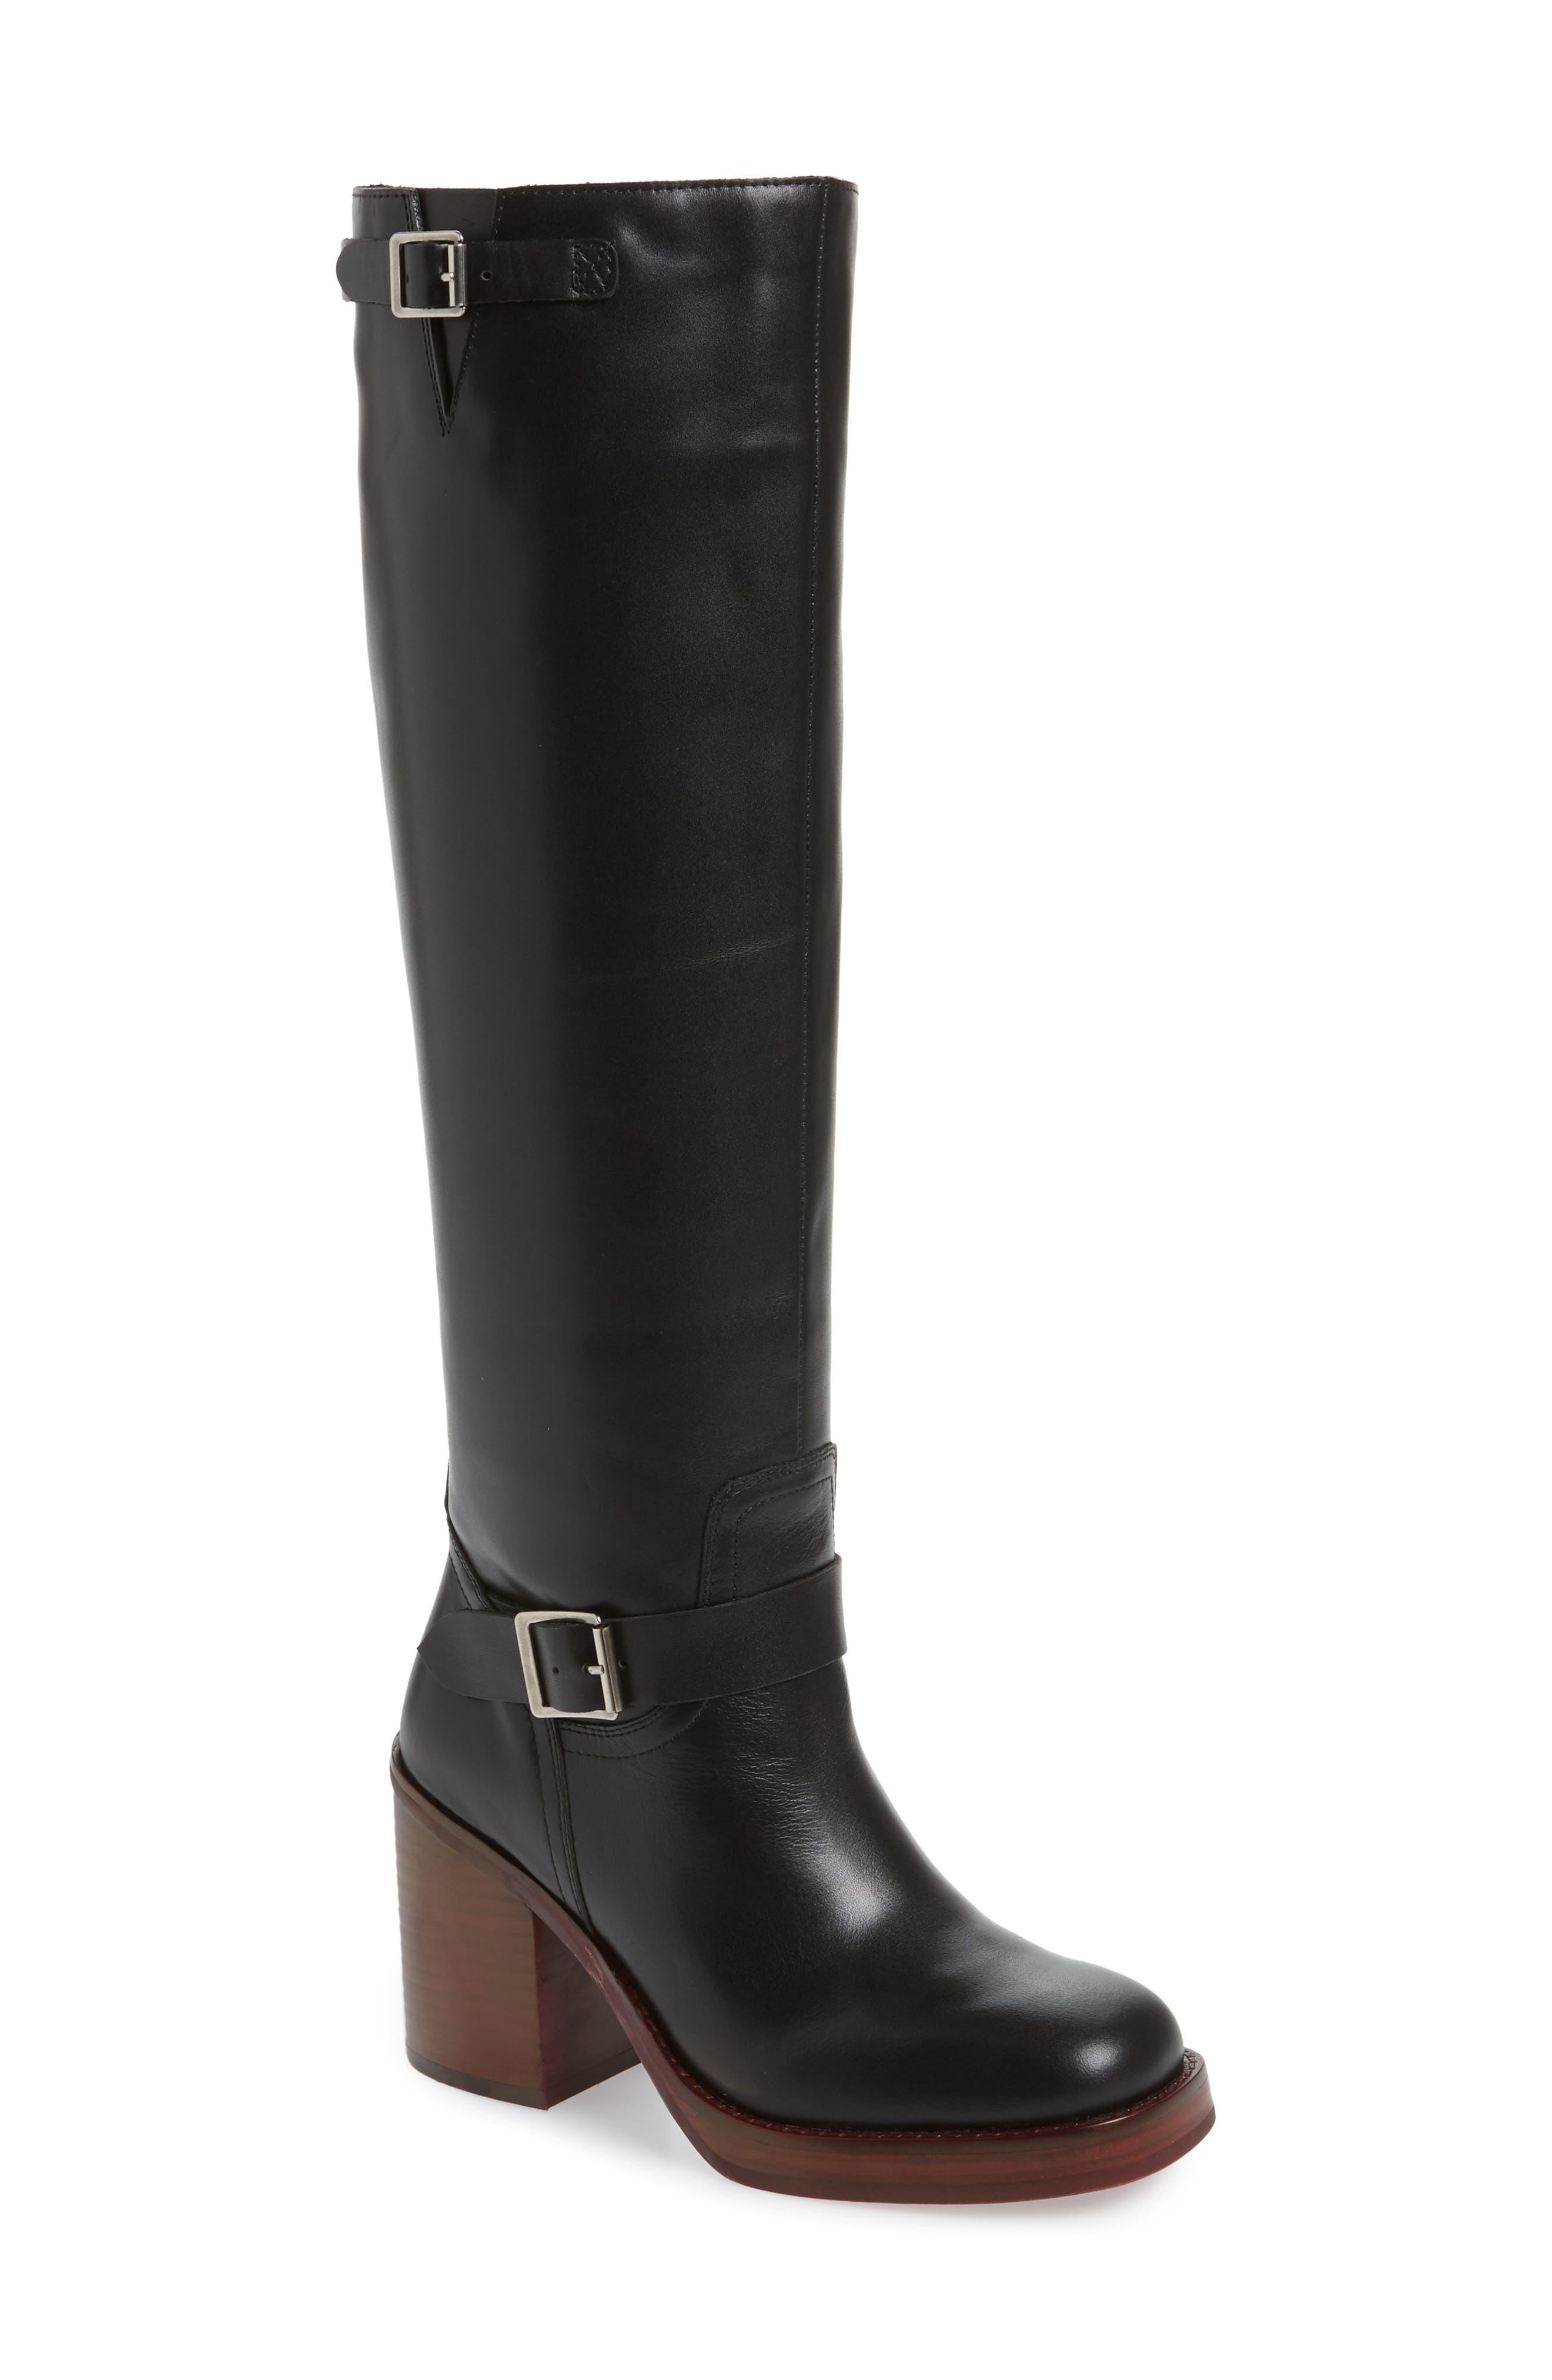 Jeffrey Campbell Lottie-2 Knee High Boot- Black